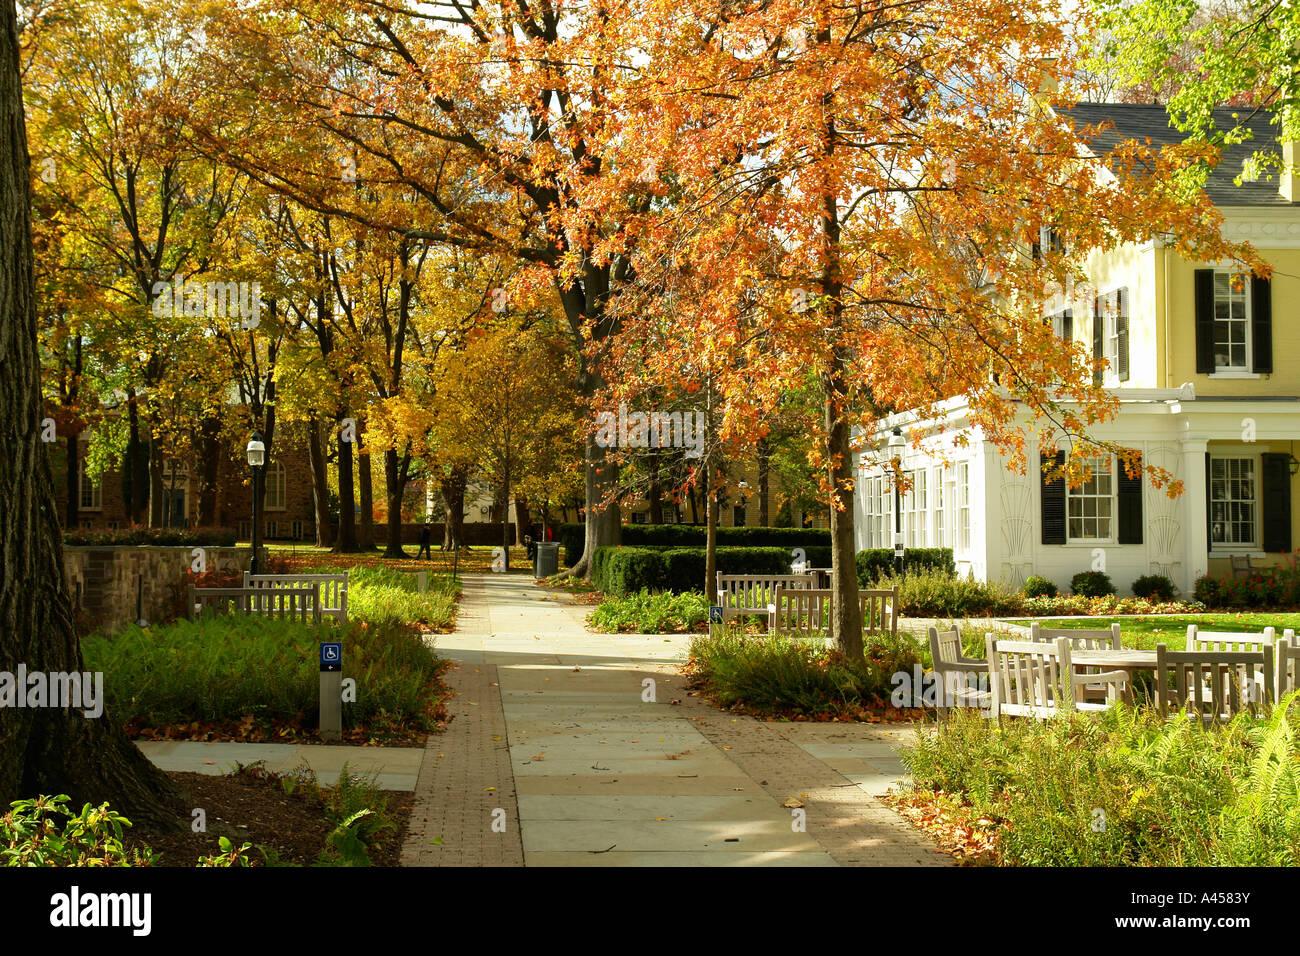 princeton university campus autumn stock photos